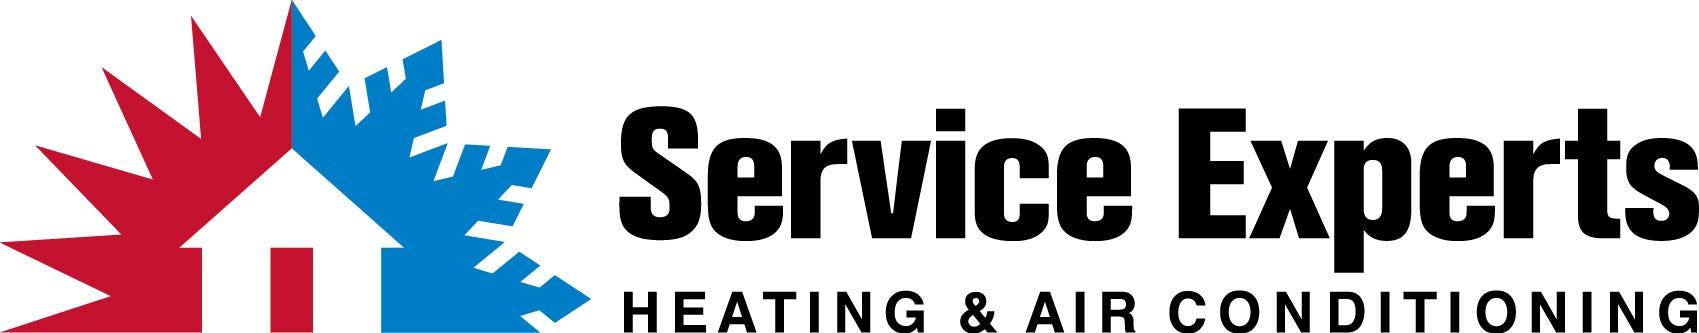 Service Experts Logo